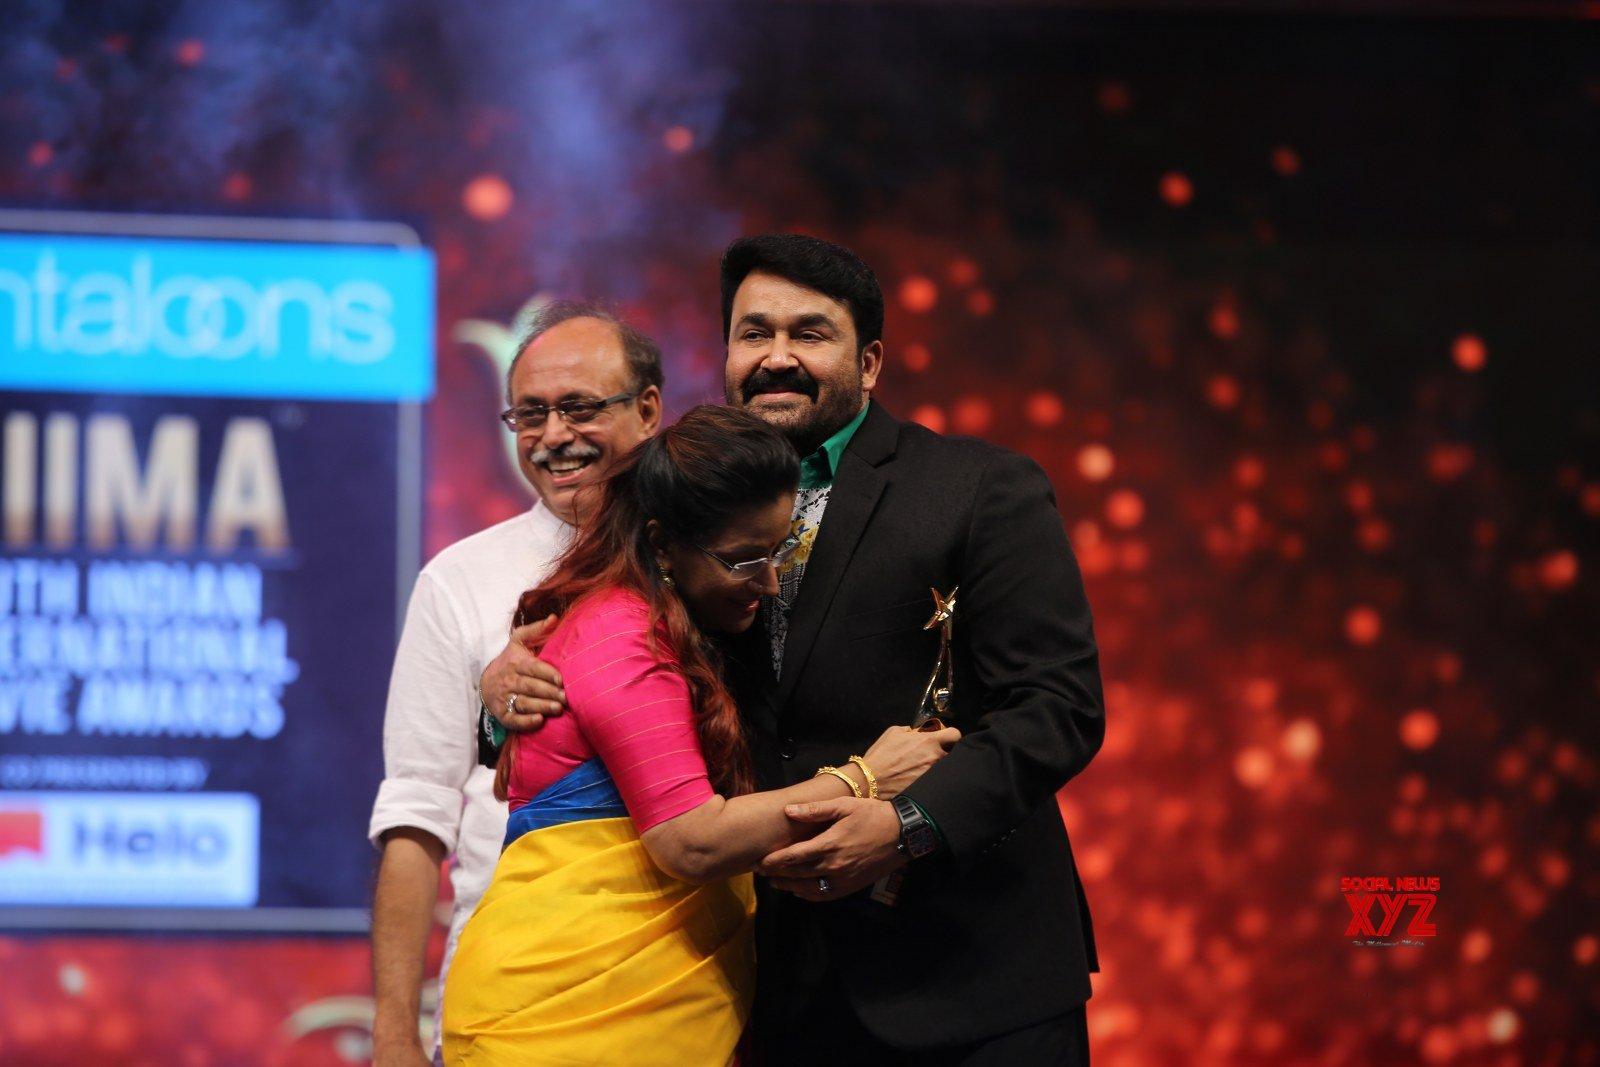 SIIMA Awards 2019 Day 2 - Tamil And Malayalam Gallery Set 2